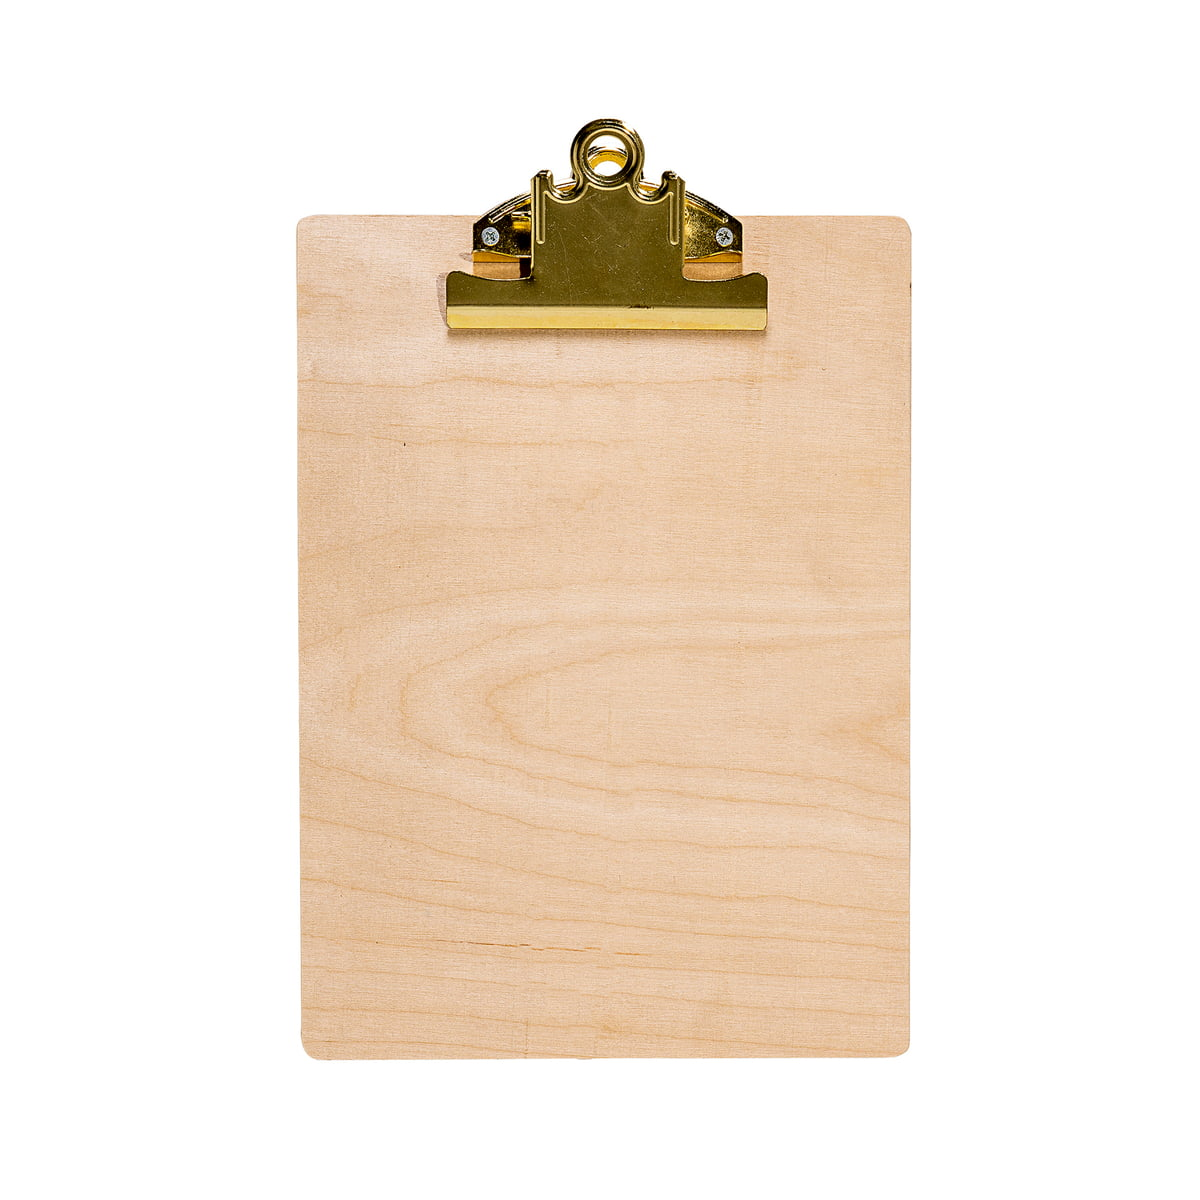 Bloomingville - Clipboard, gold